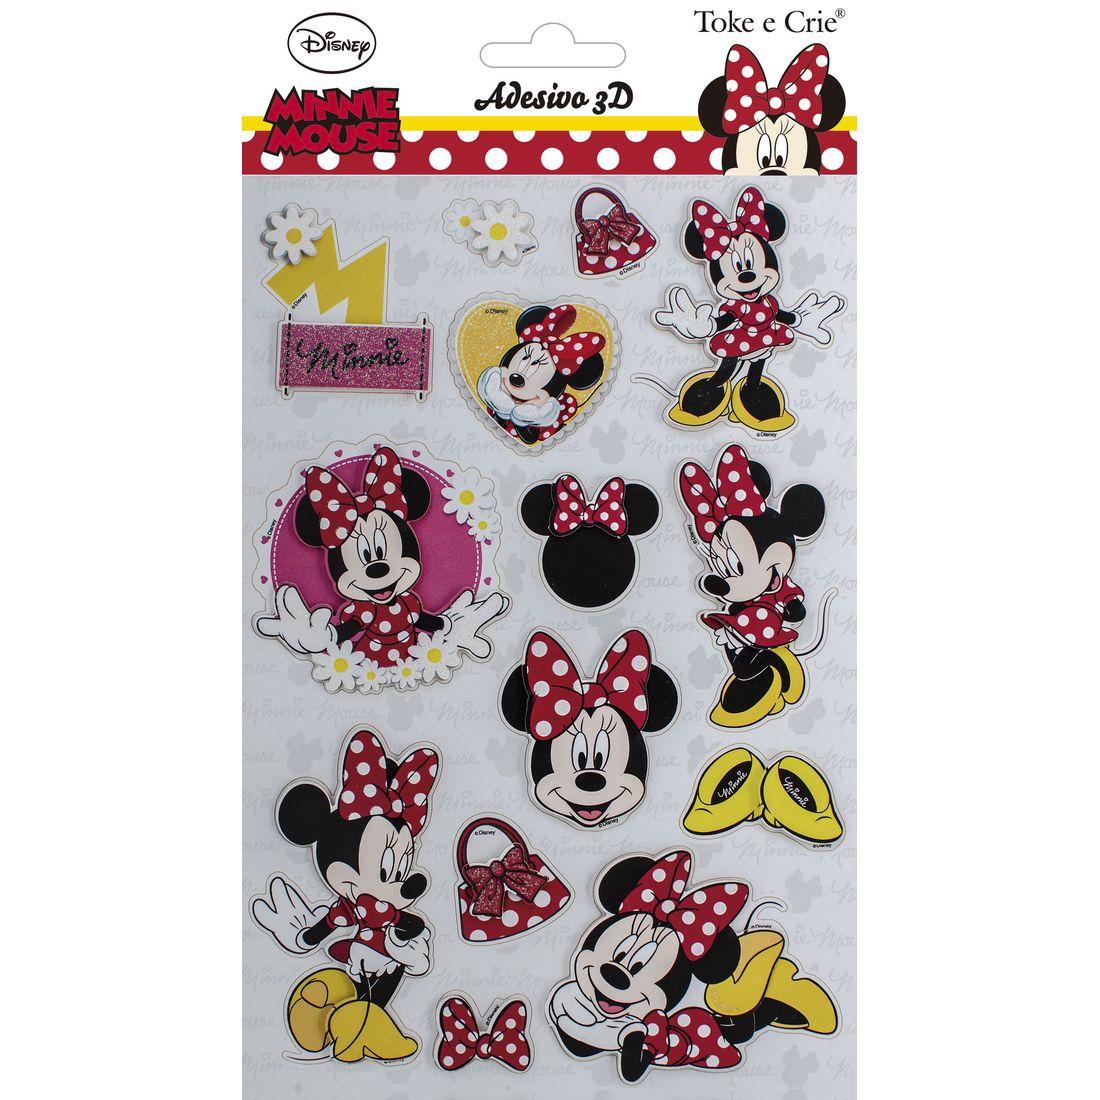 Adesivo-3D-14X21cm-Minnie-Mouse-Add02-Toke-e-Crie